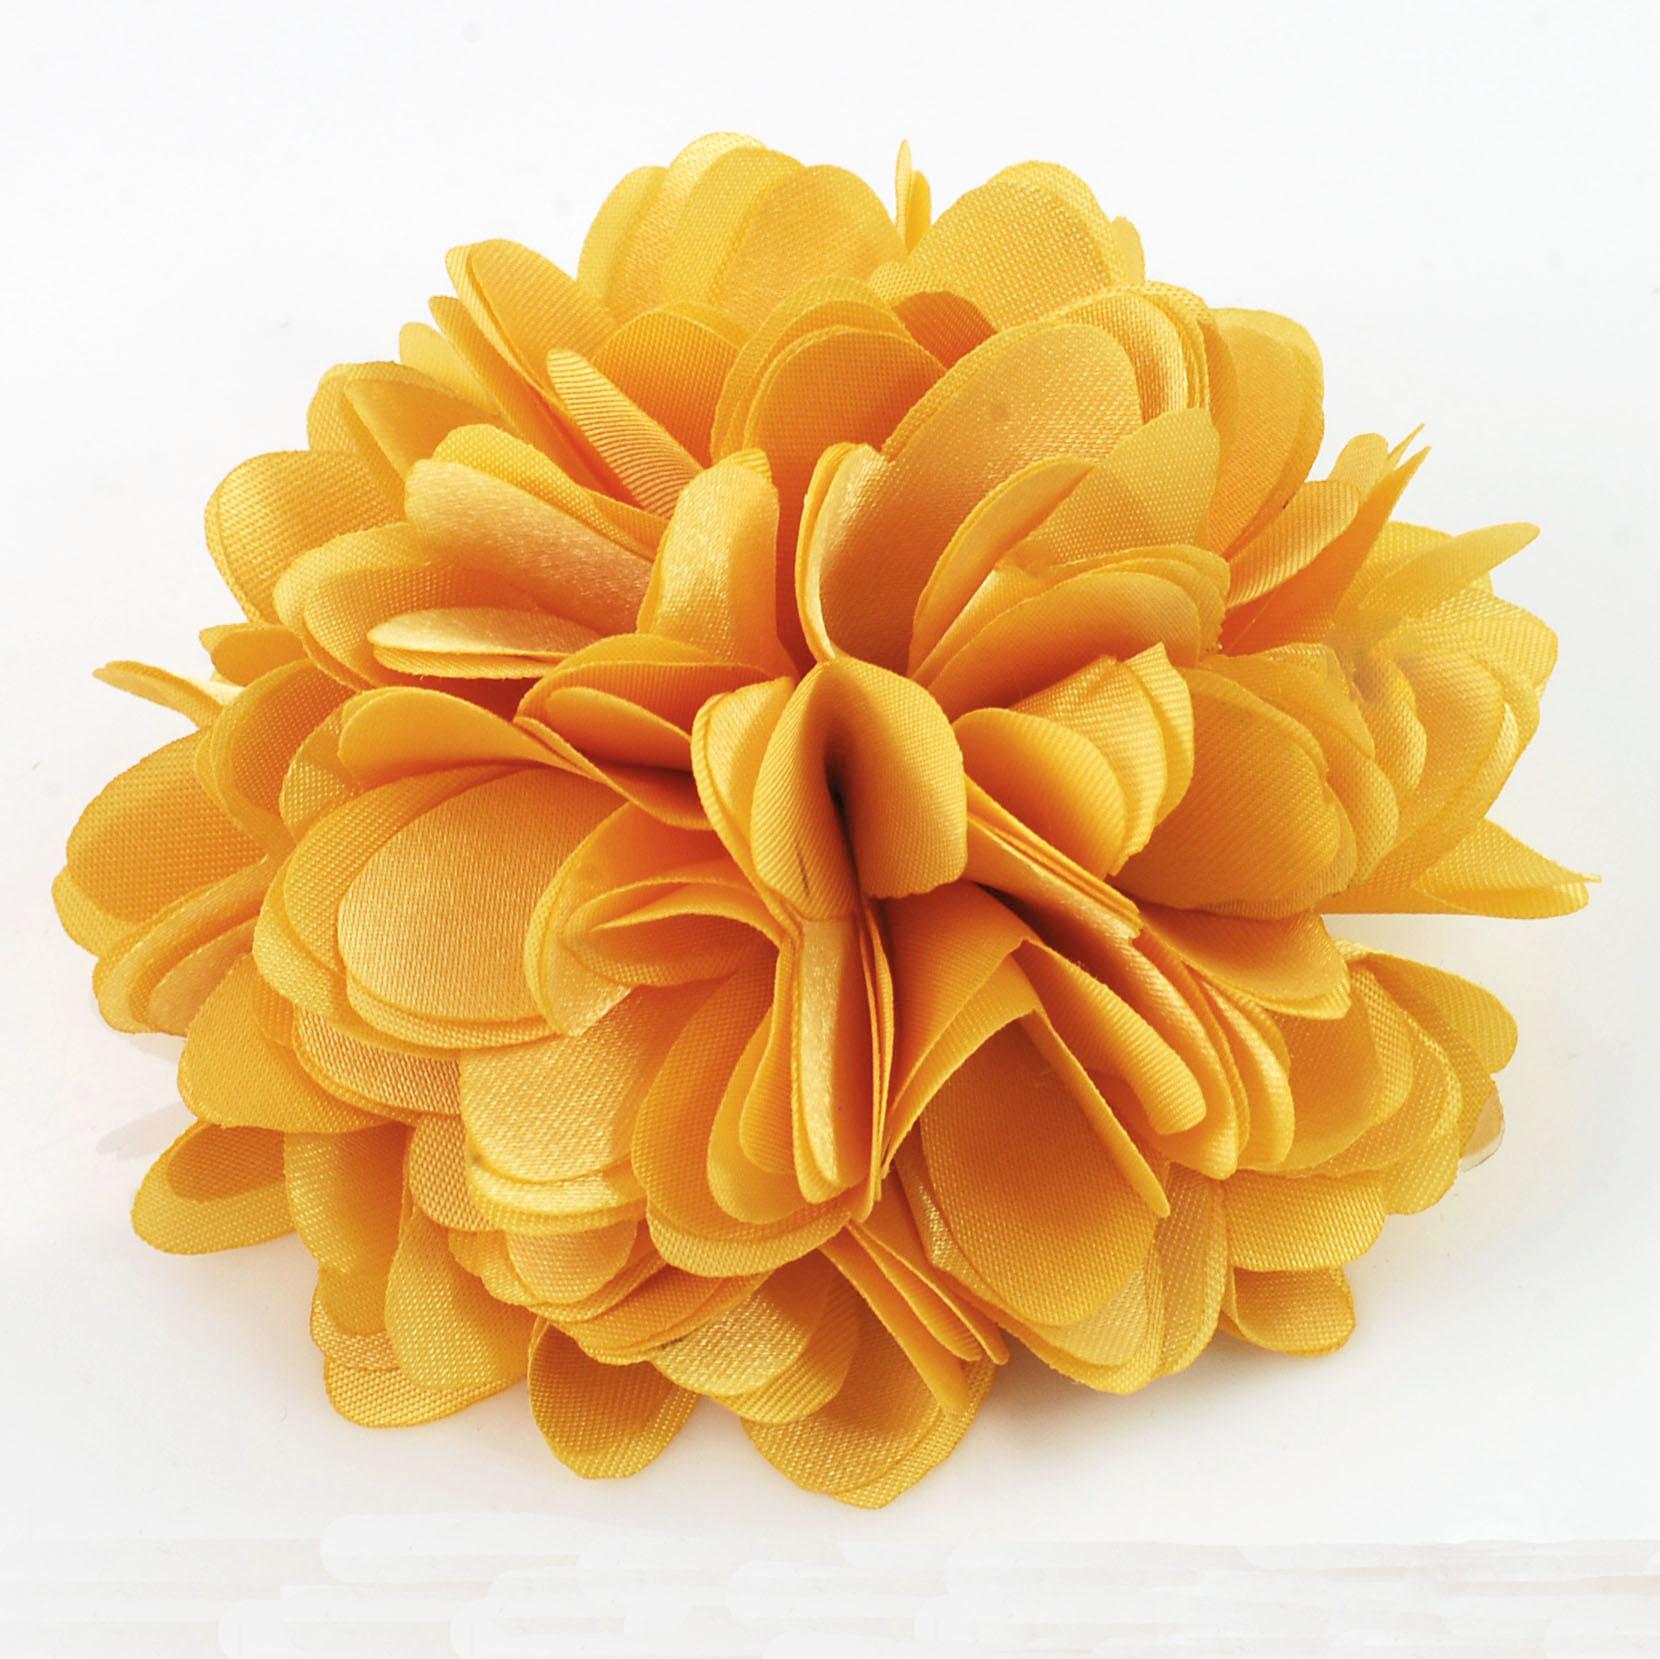 Yellow satin flower pin fr191003 yellow satin flower pin mightylinksfo